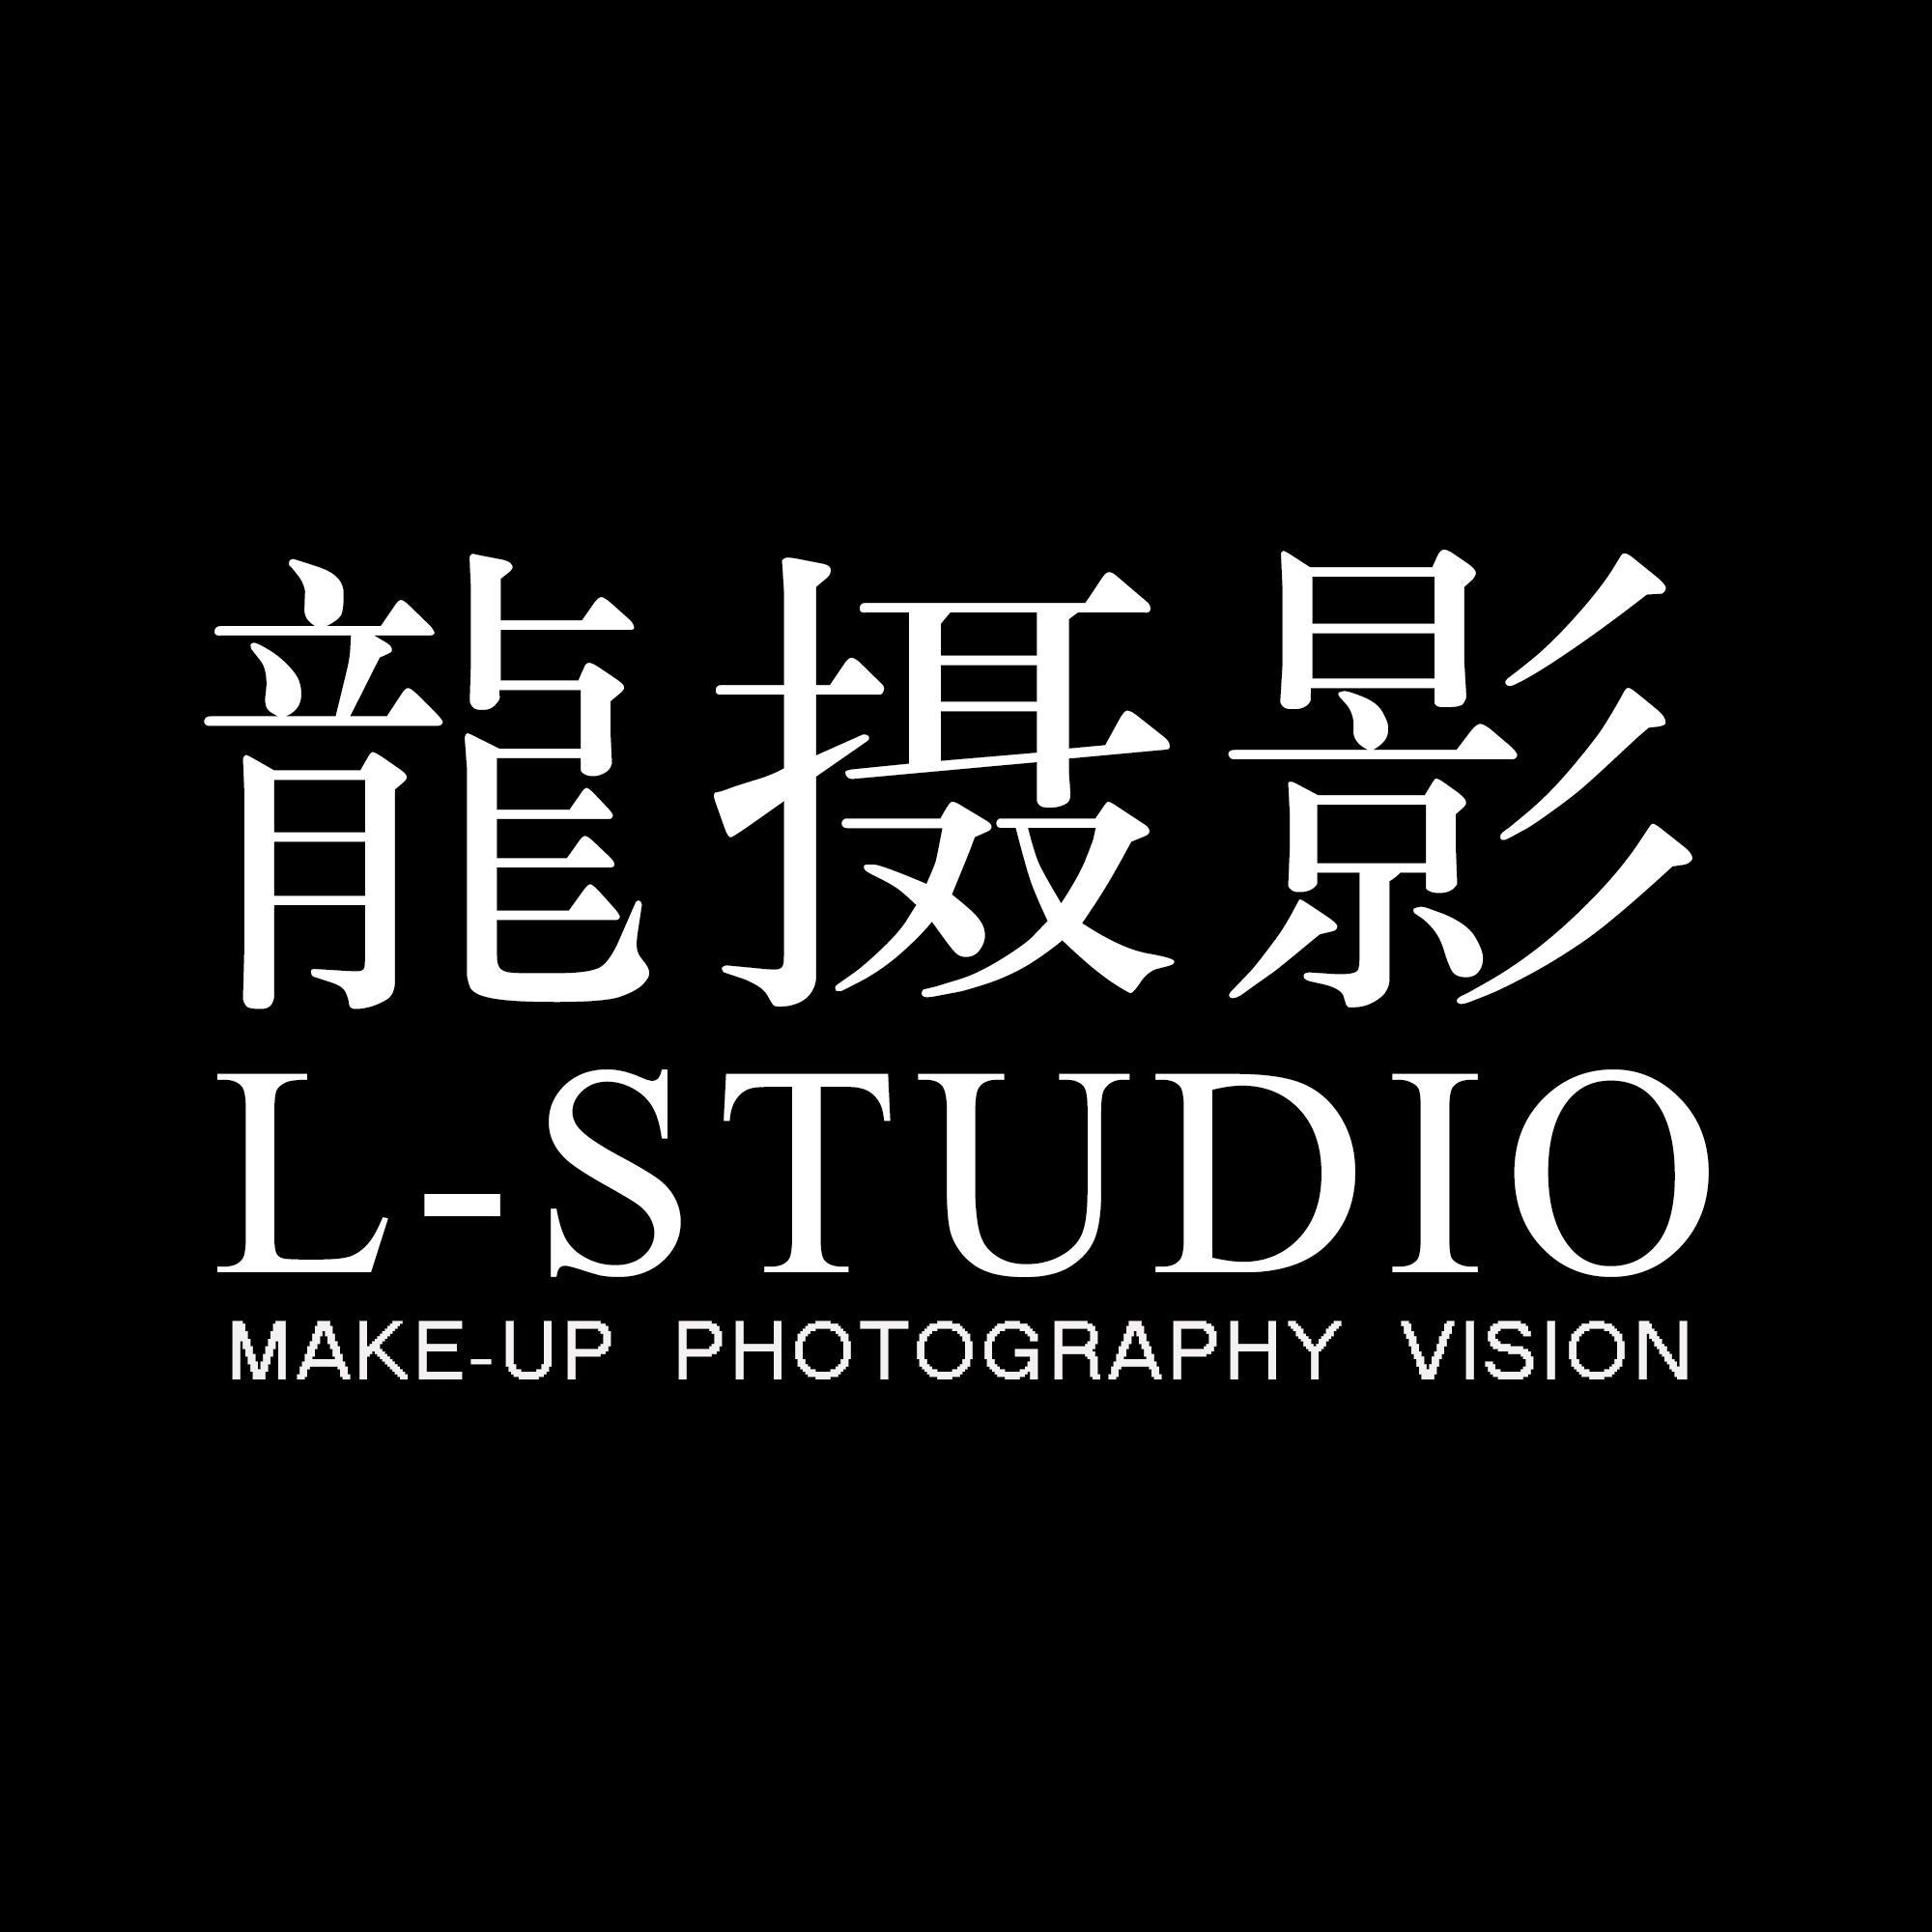 合肥龙摄影STUDIO(旗舰店)